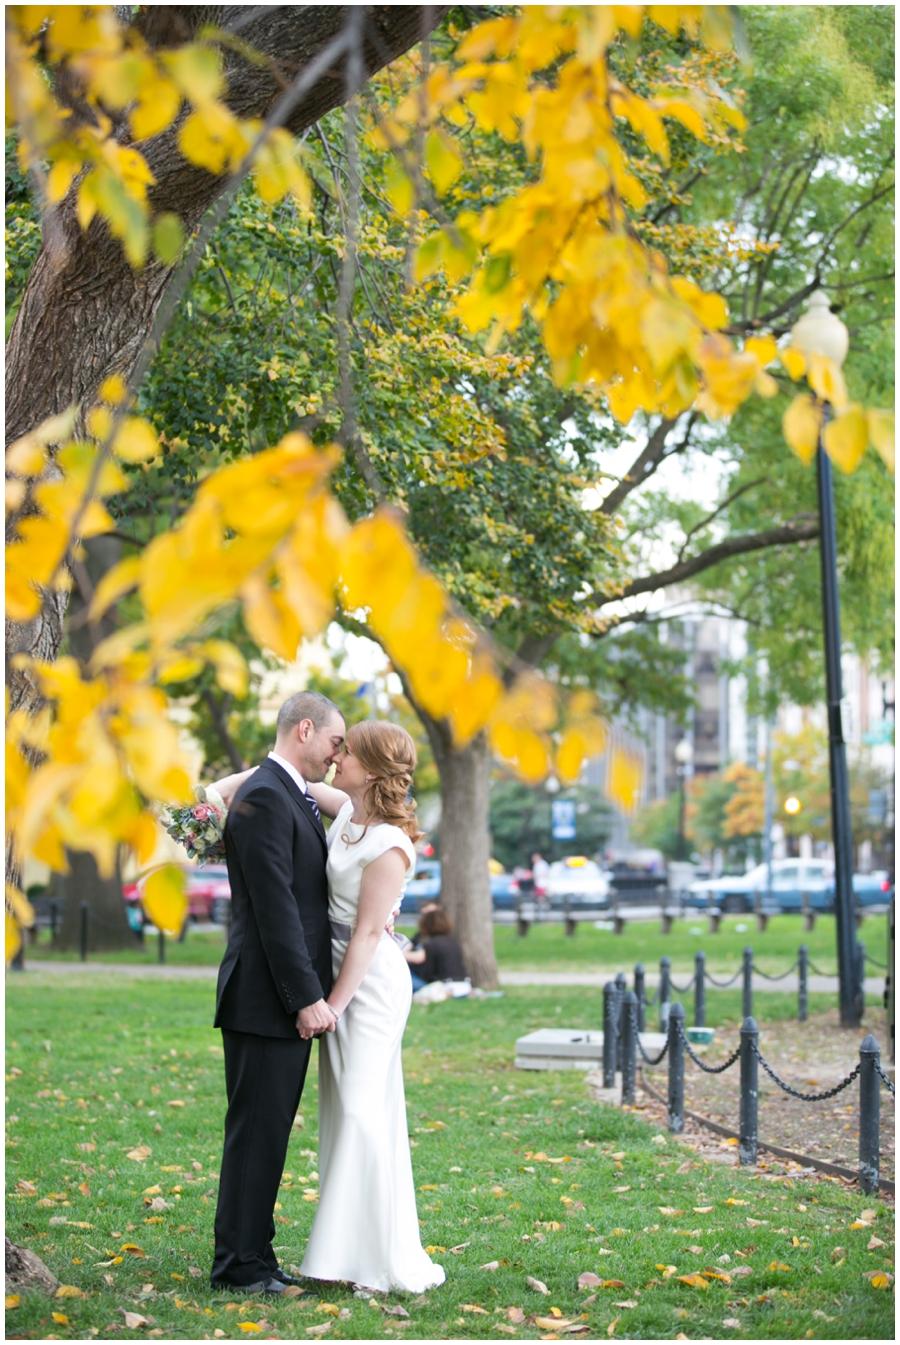 The Whittemore House Wedding Photographer - Best wedding photographs of 2013